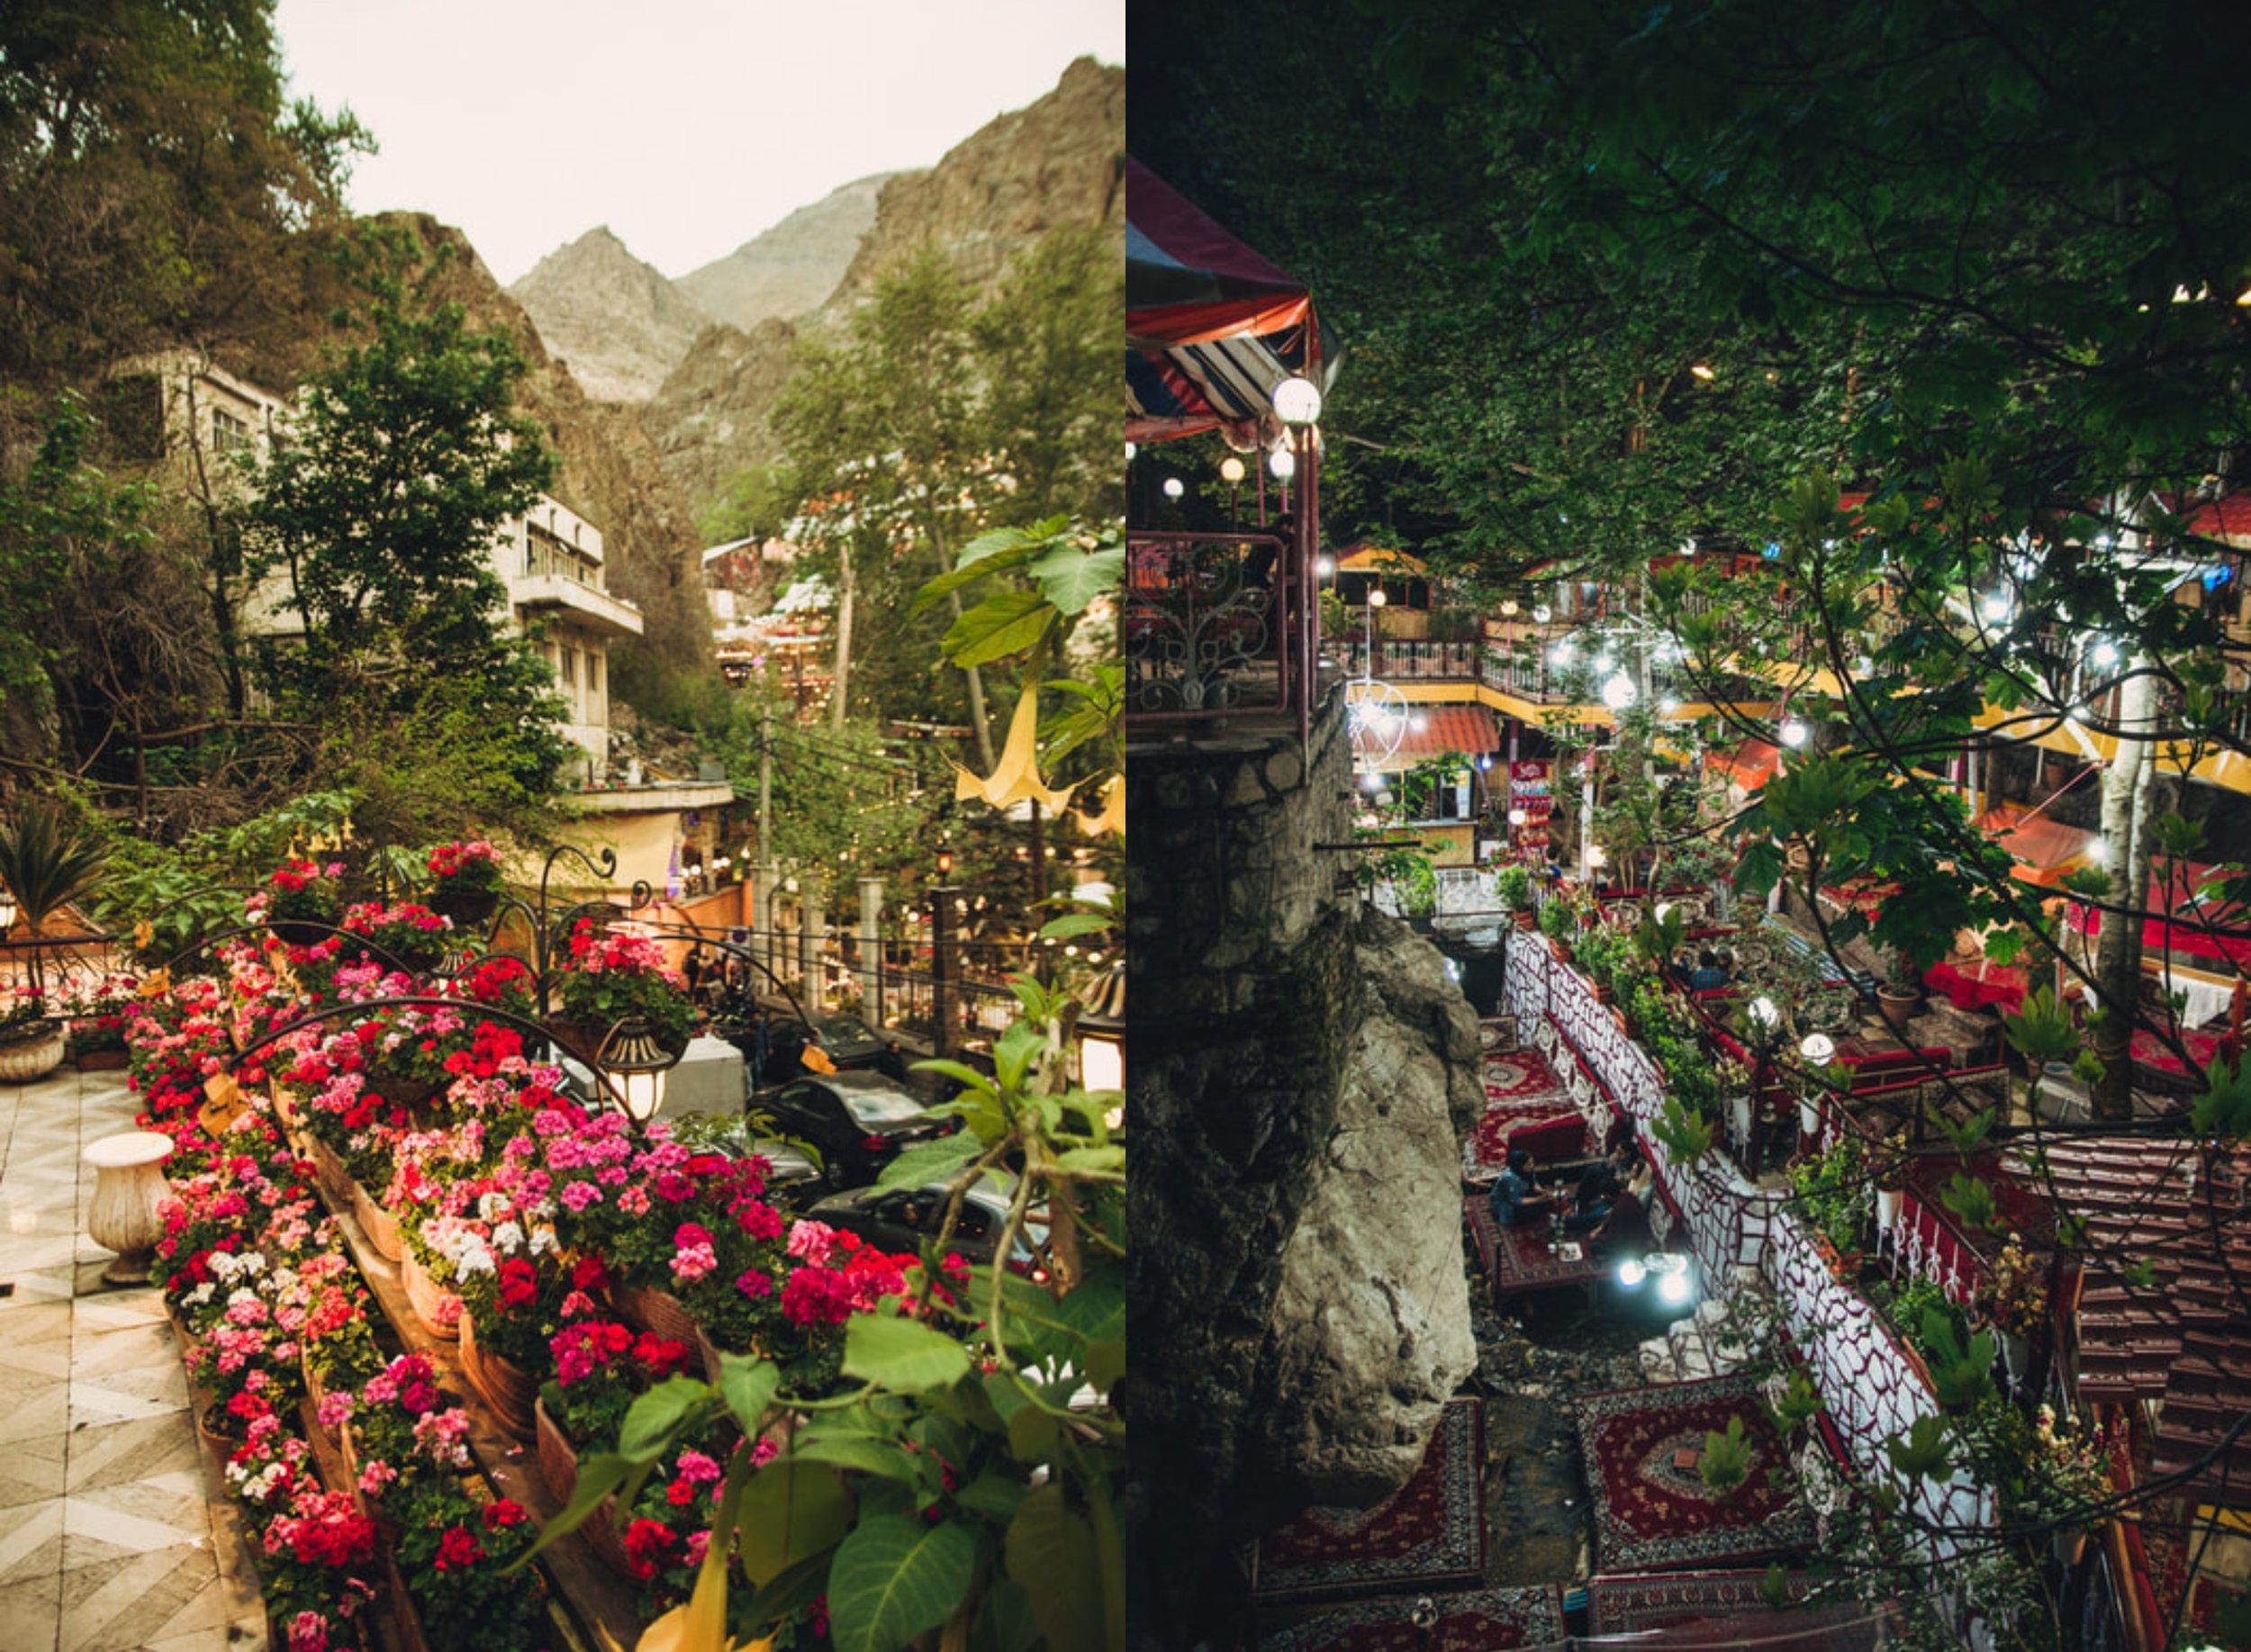 Iran Trip-collage2.jpg